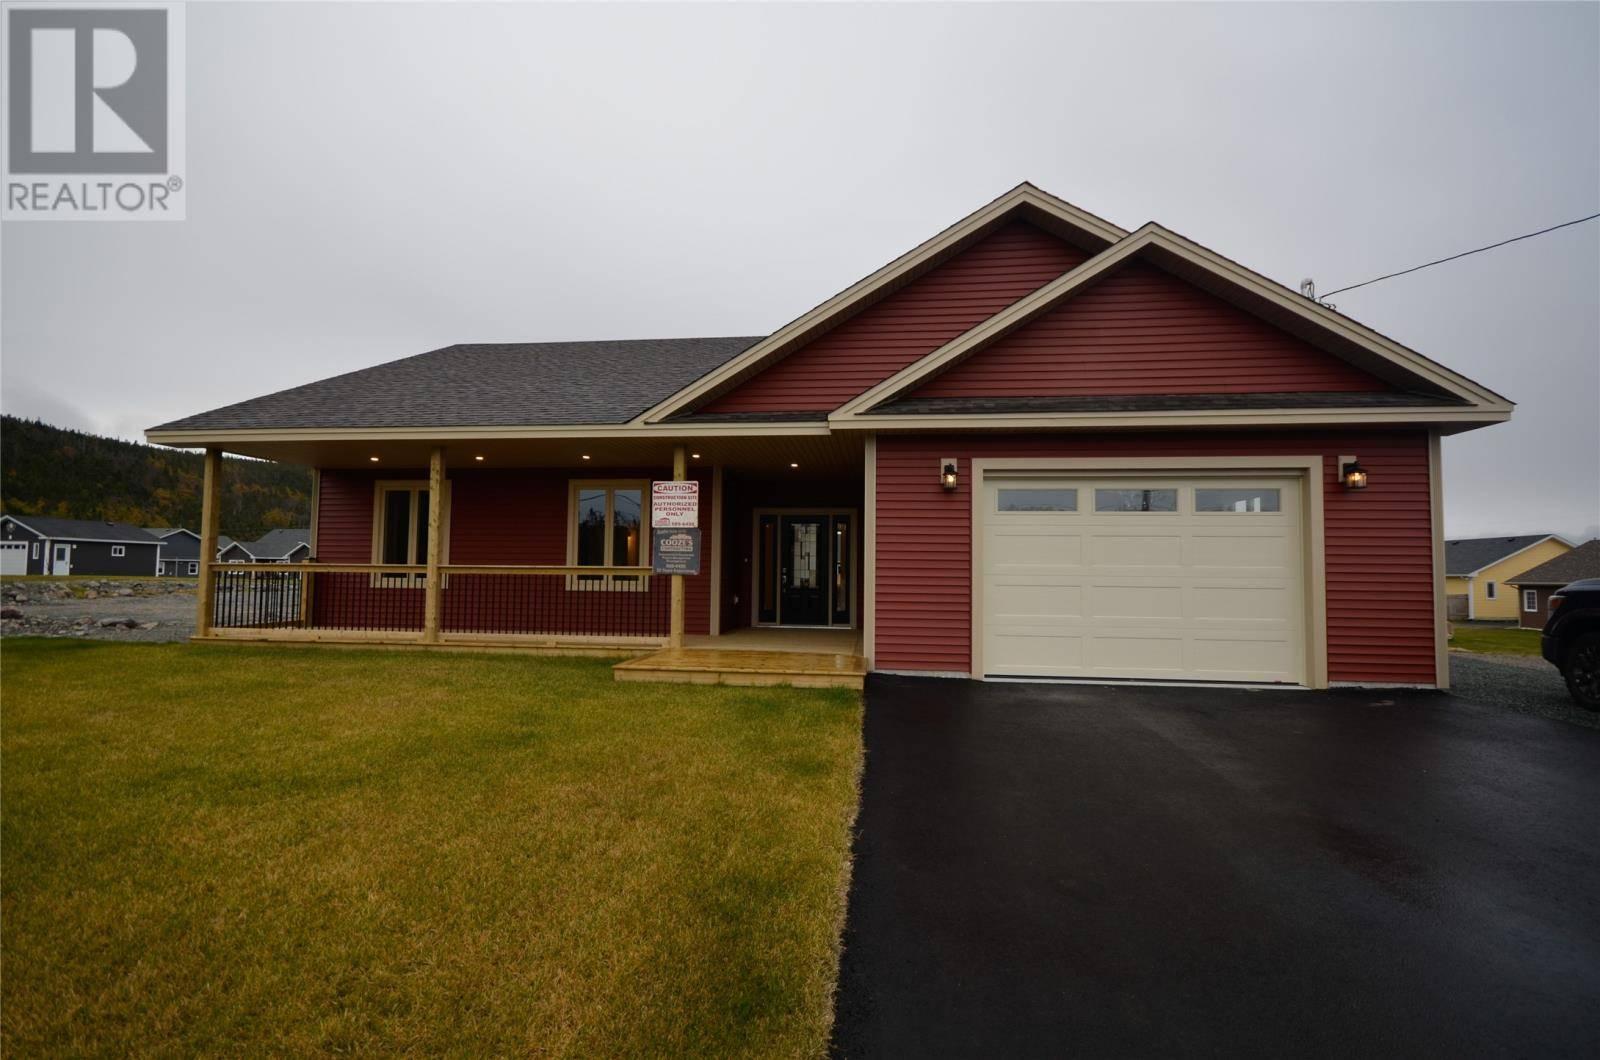 House for sale at 6 Saul Dr Holyrood Newfoundland - MLS: 1187237